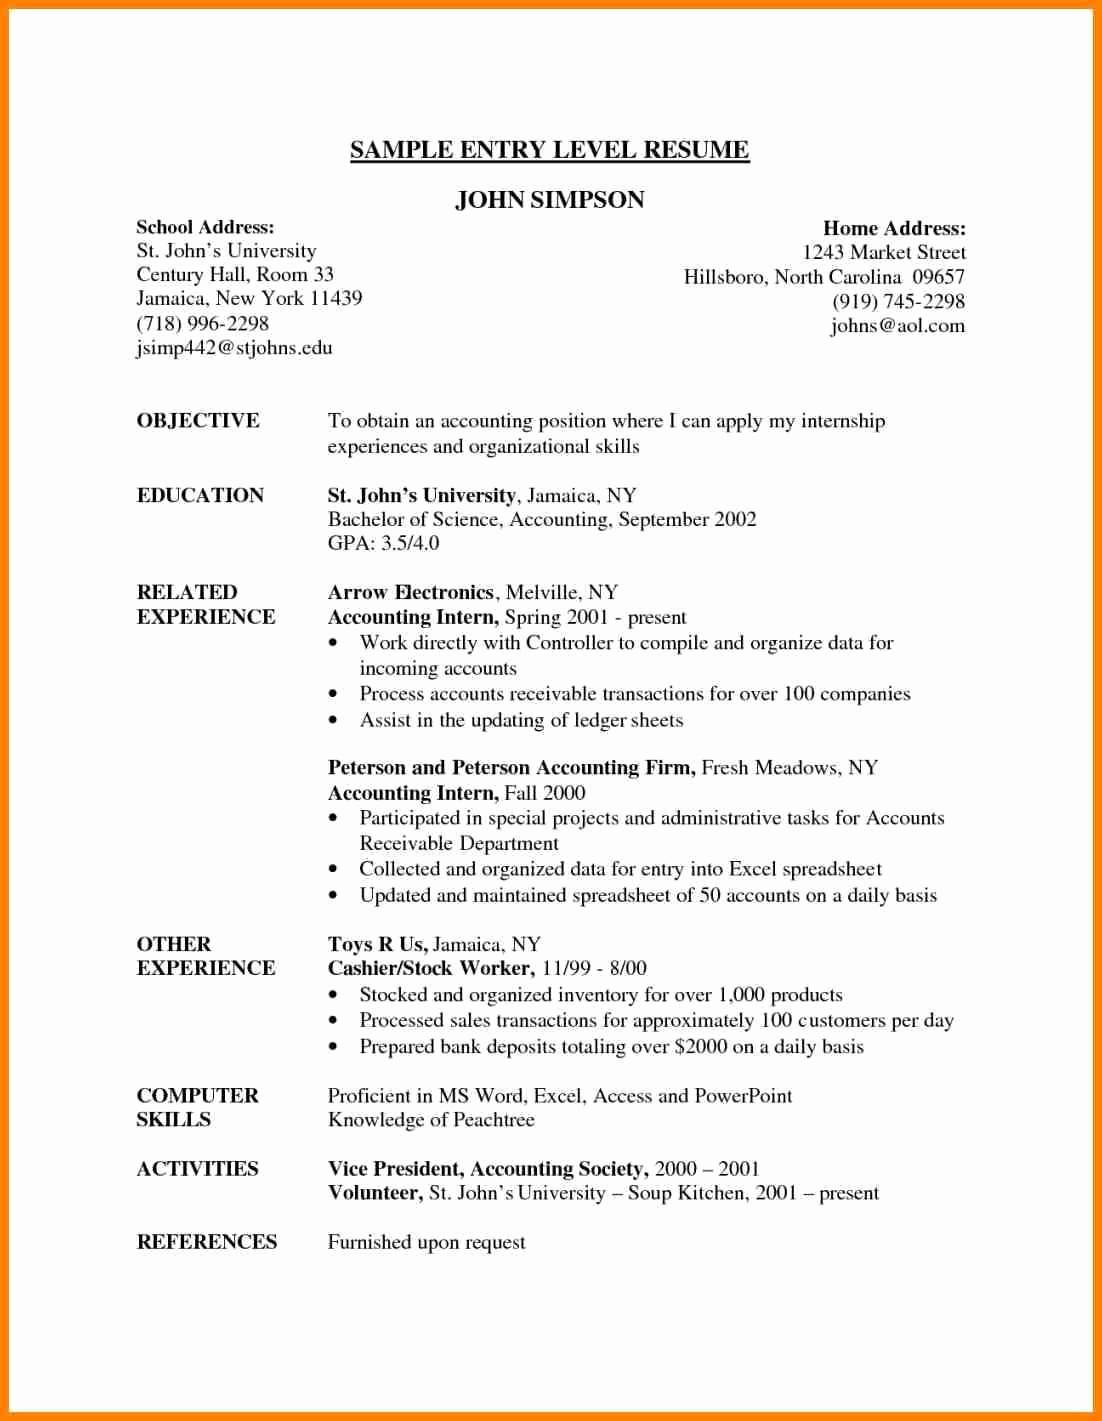 Data Analyst Resume Entry Level Inspirational 29 Last Entry Level Financial Analyst Resume Dt E